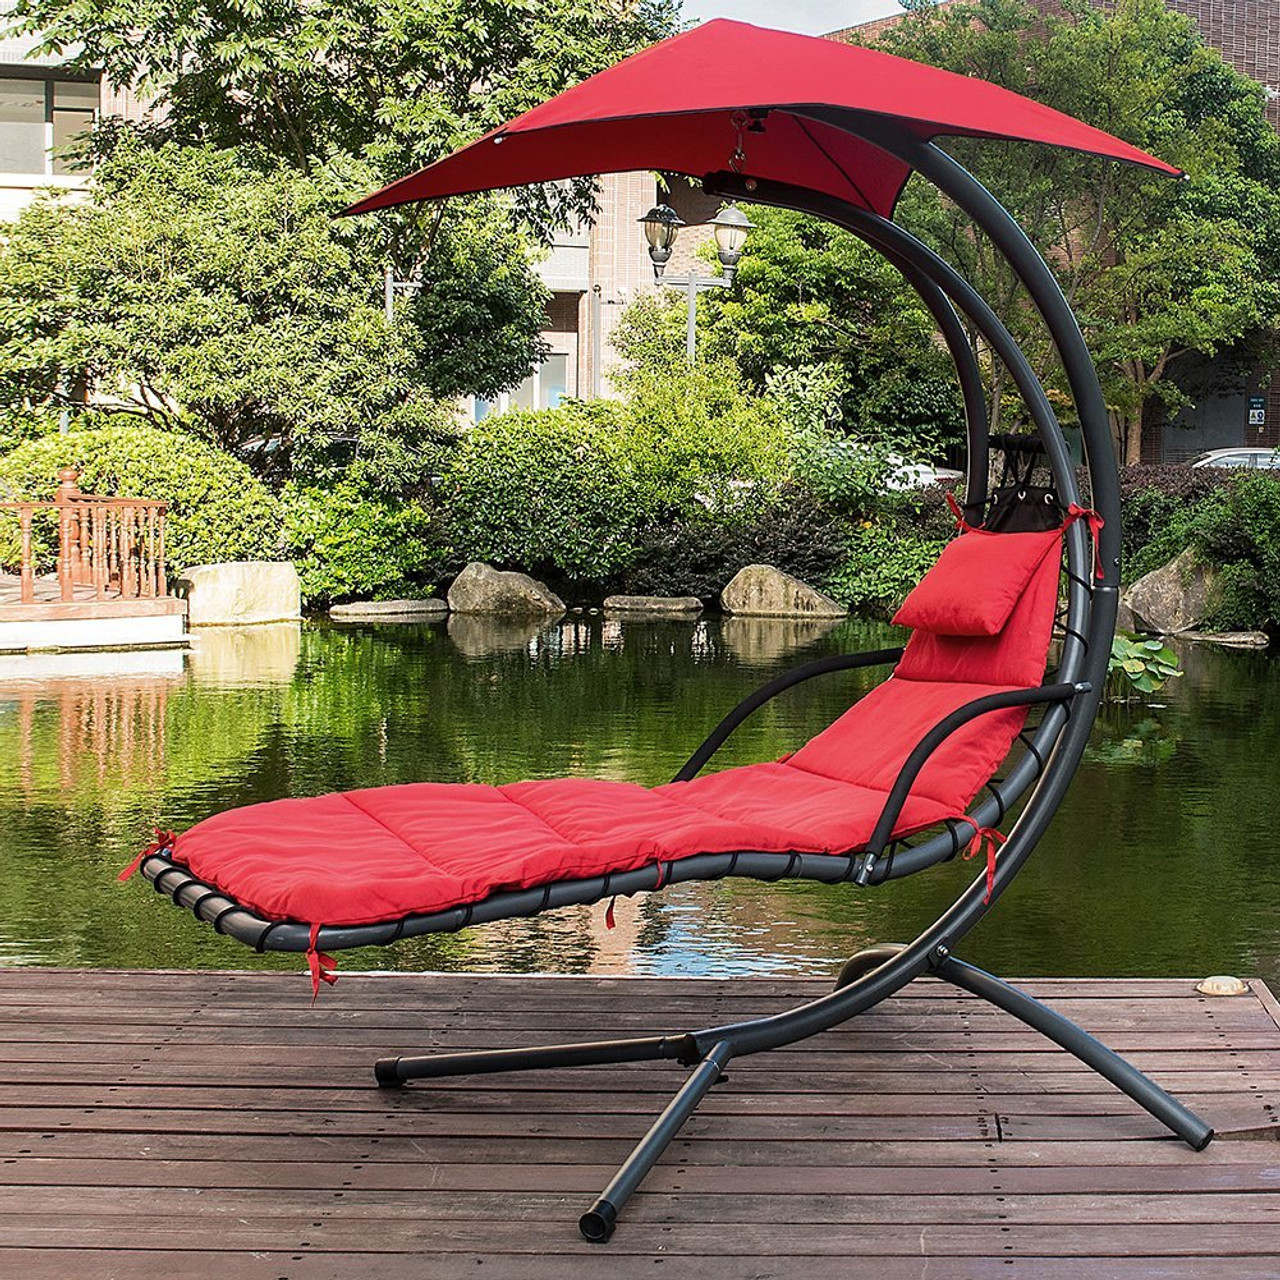 lazy daze hammocks dream chair with umbrella hanging chaise lounge chair arc curved hammock  red dream chair red   rh   sundaleoutdoor